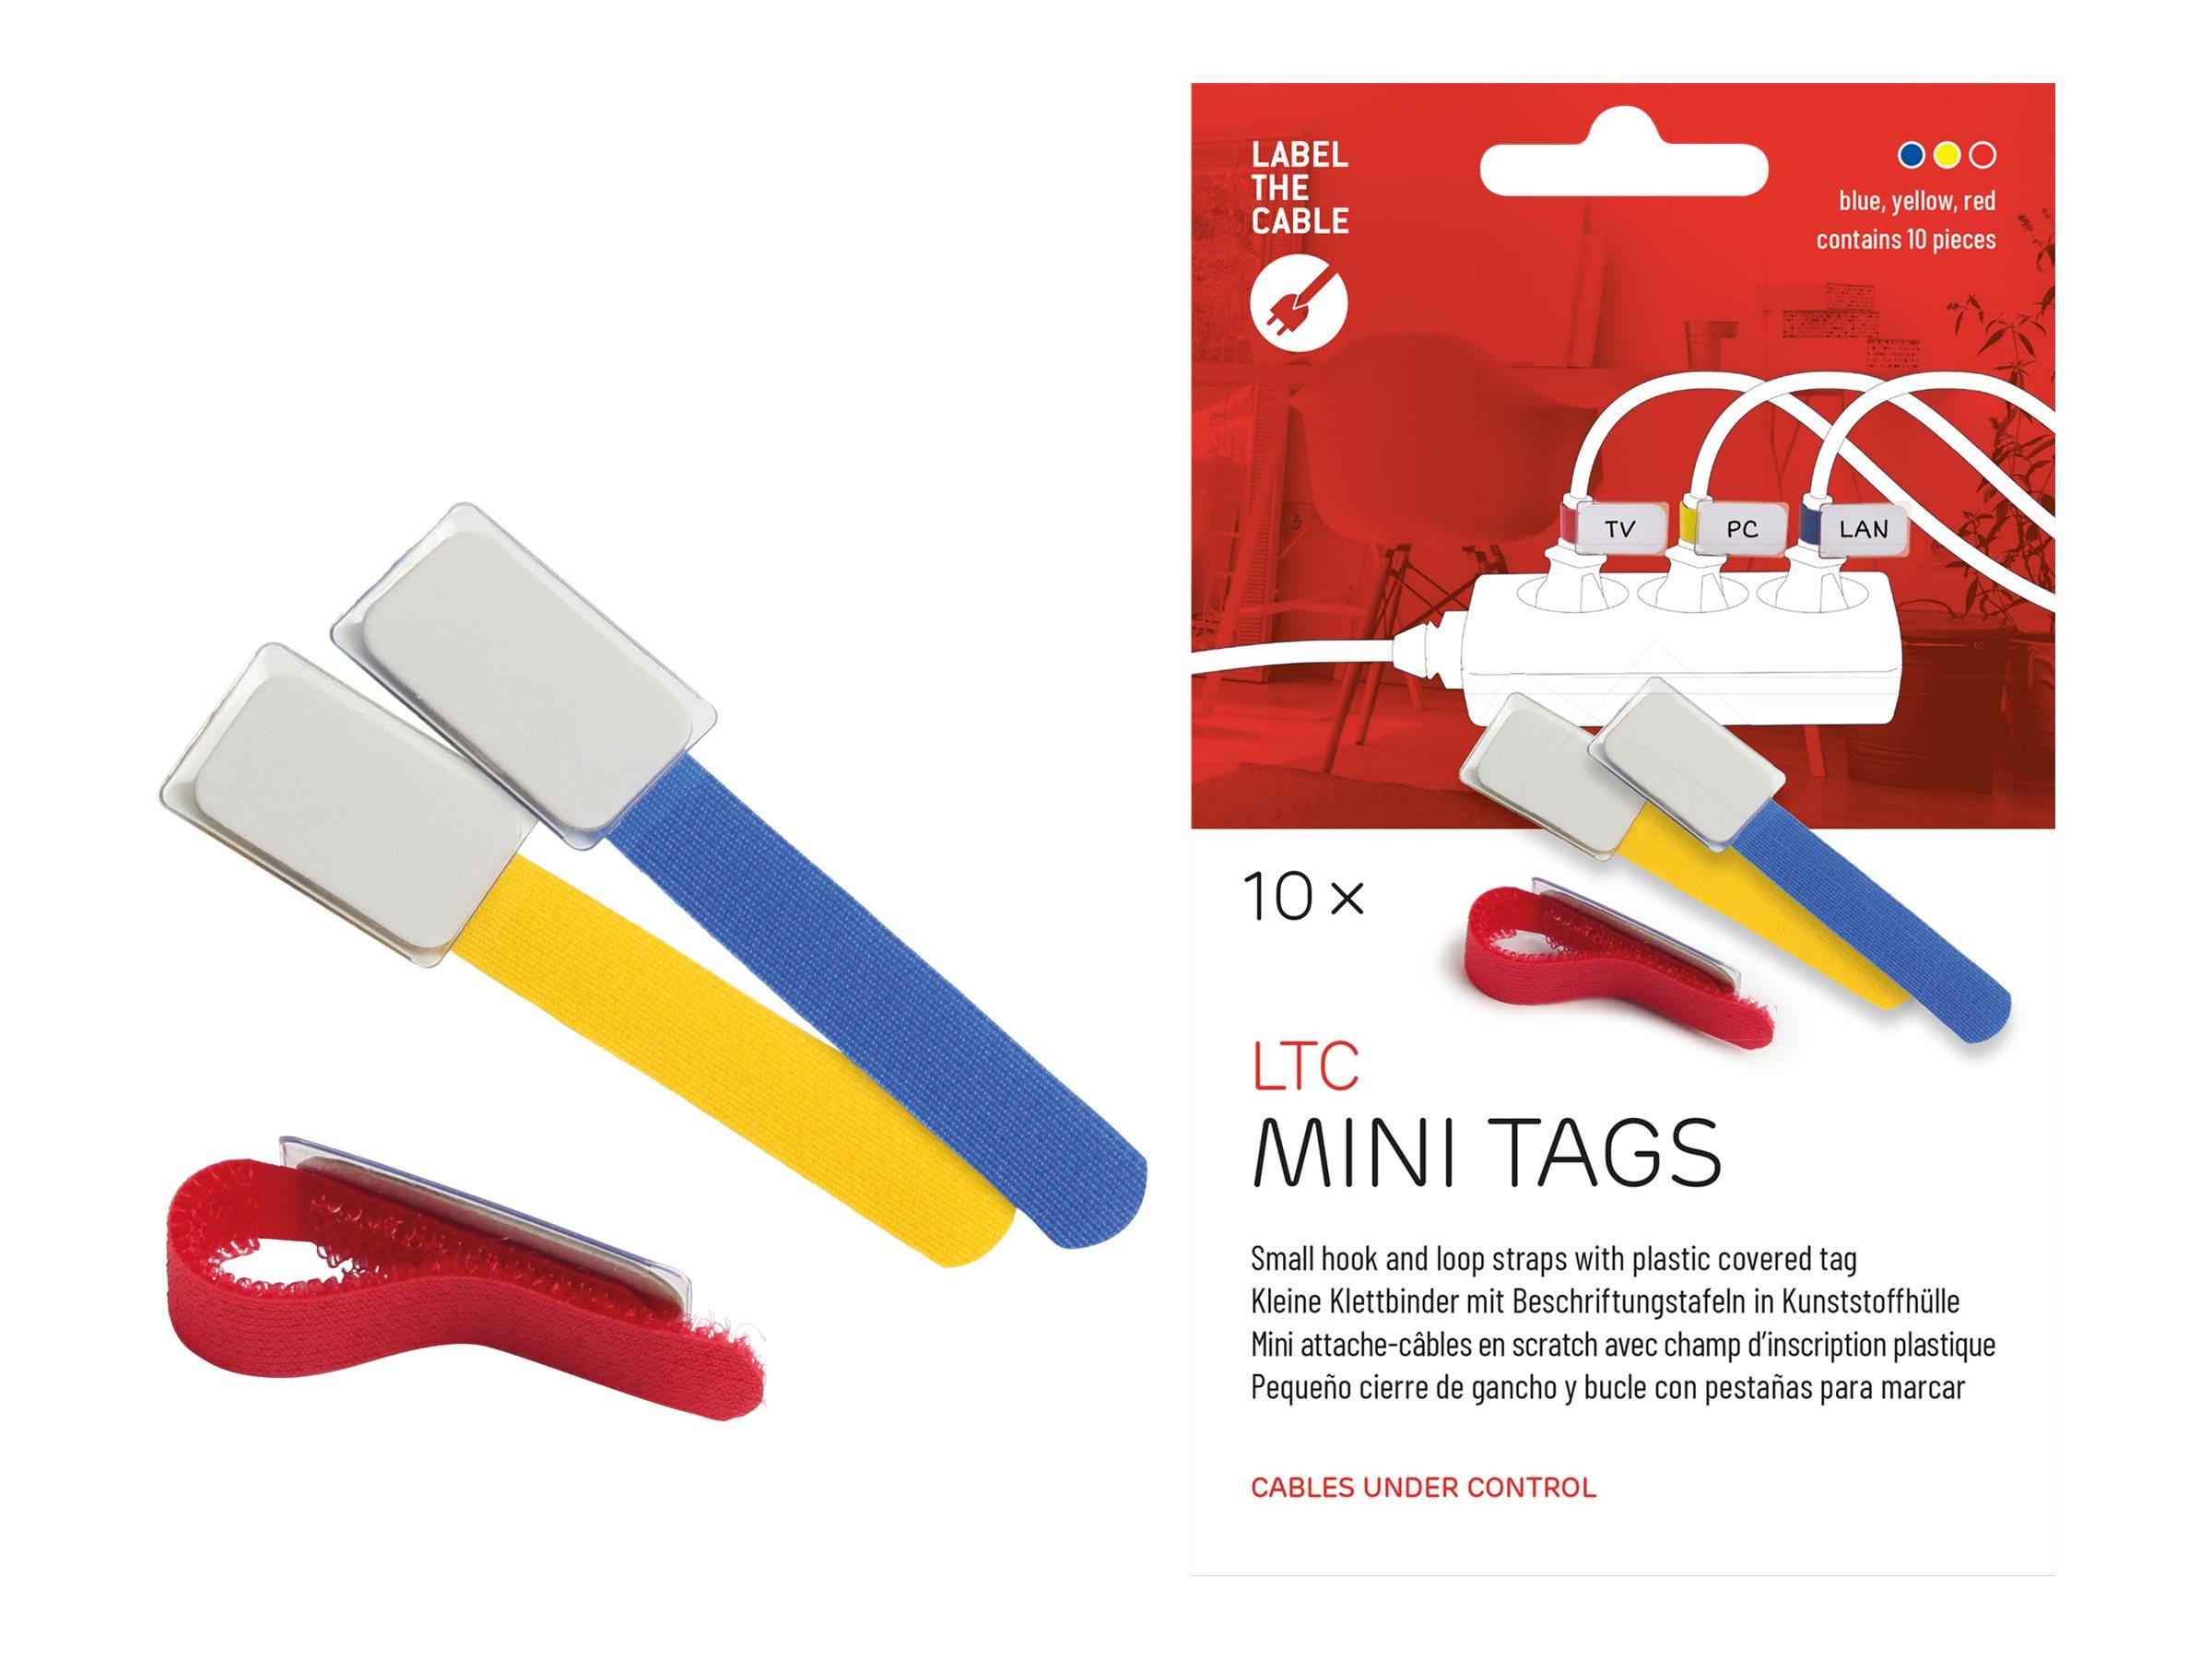 LTC MINI TAGS - Draht-/Kabel-Marker - 9 cm - Blau, Gelb, Rot (Packung mit 10)